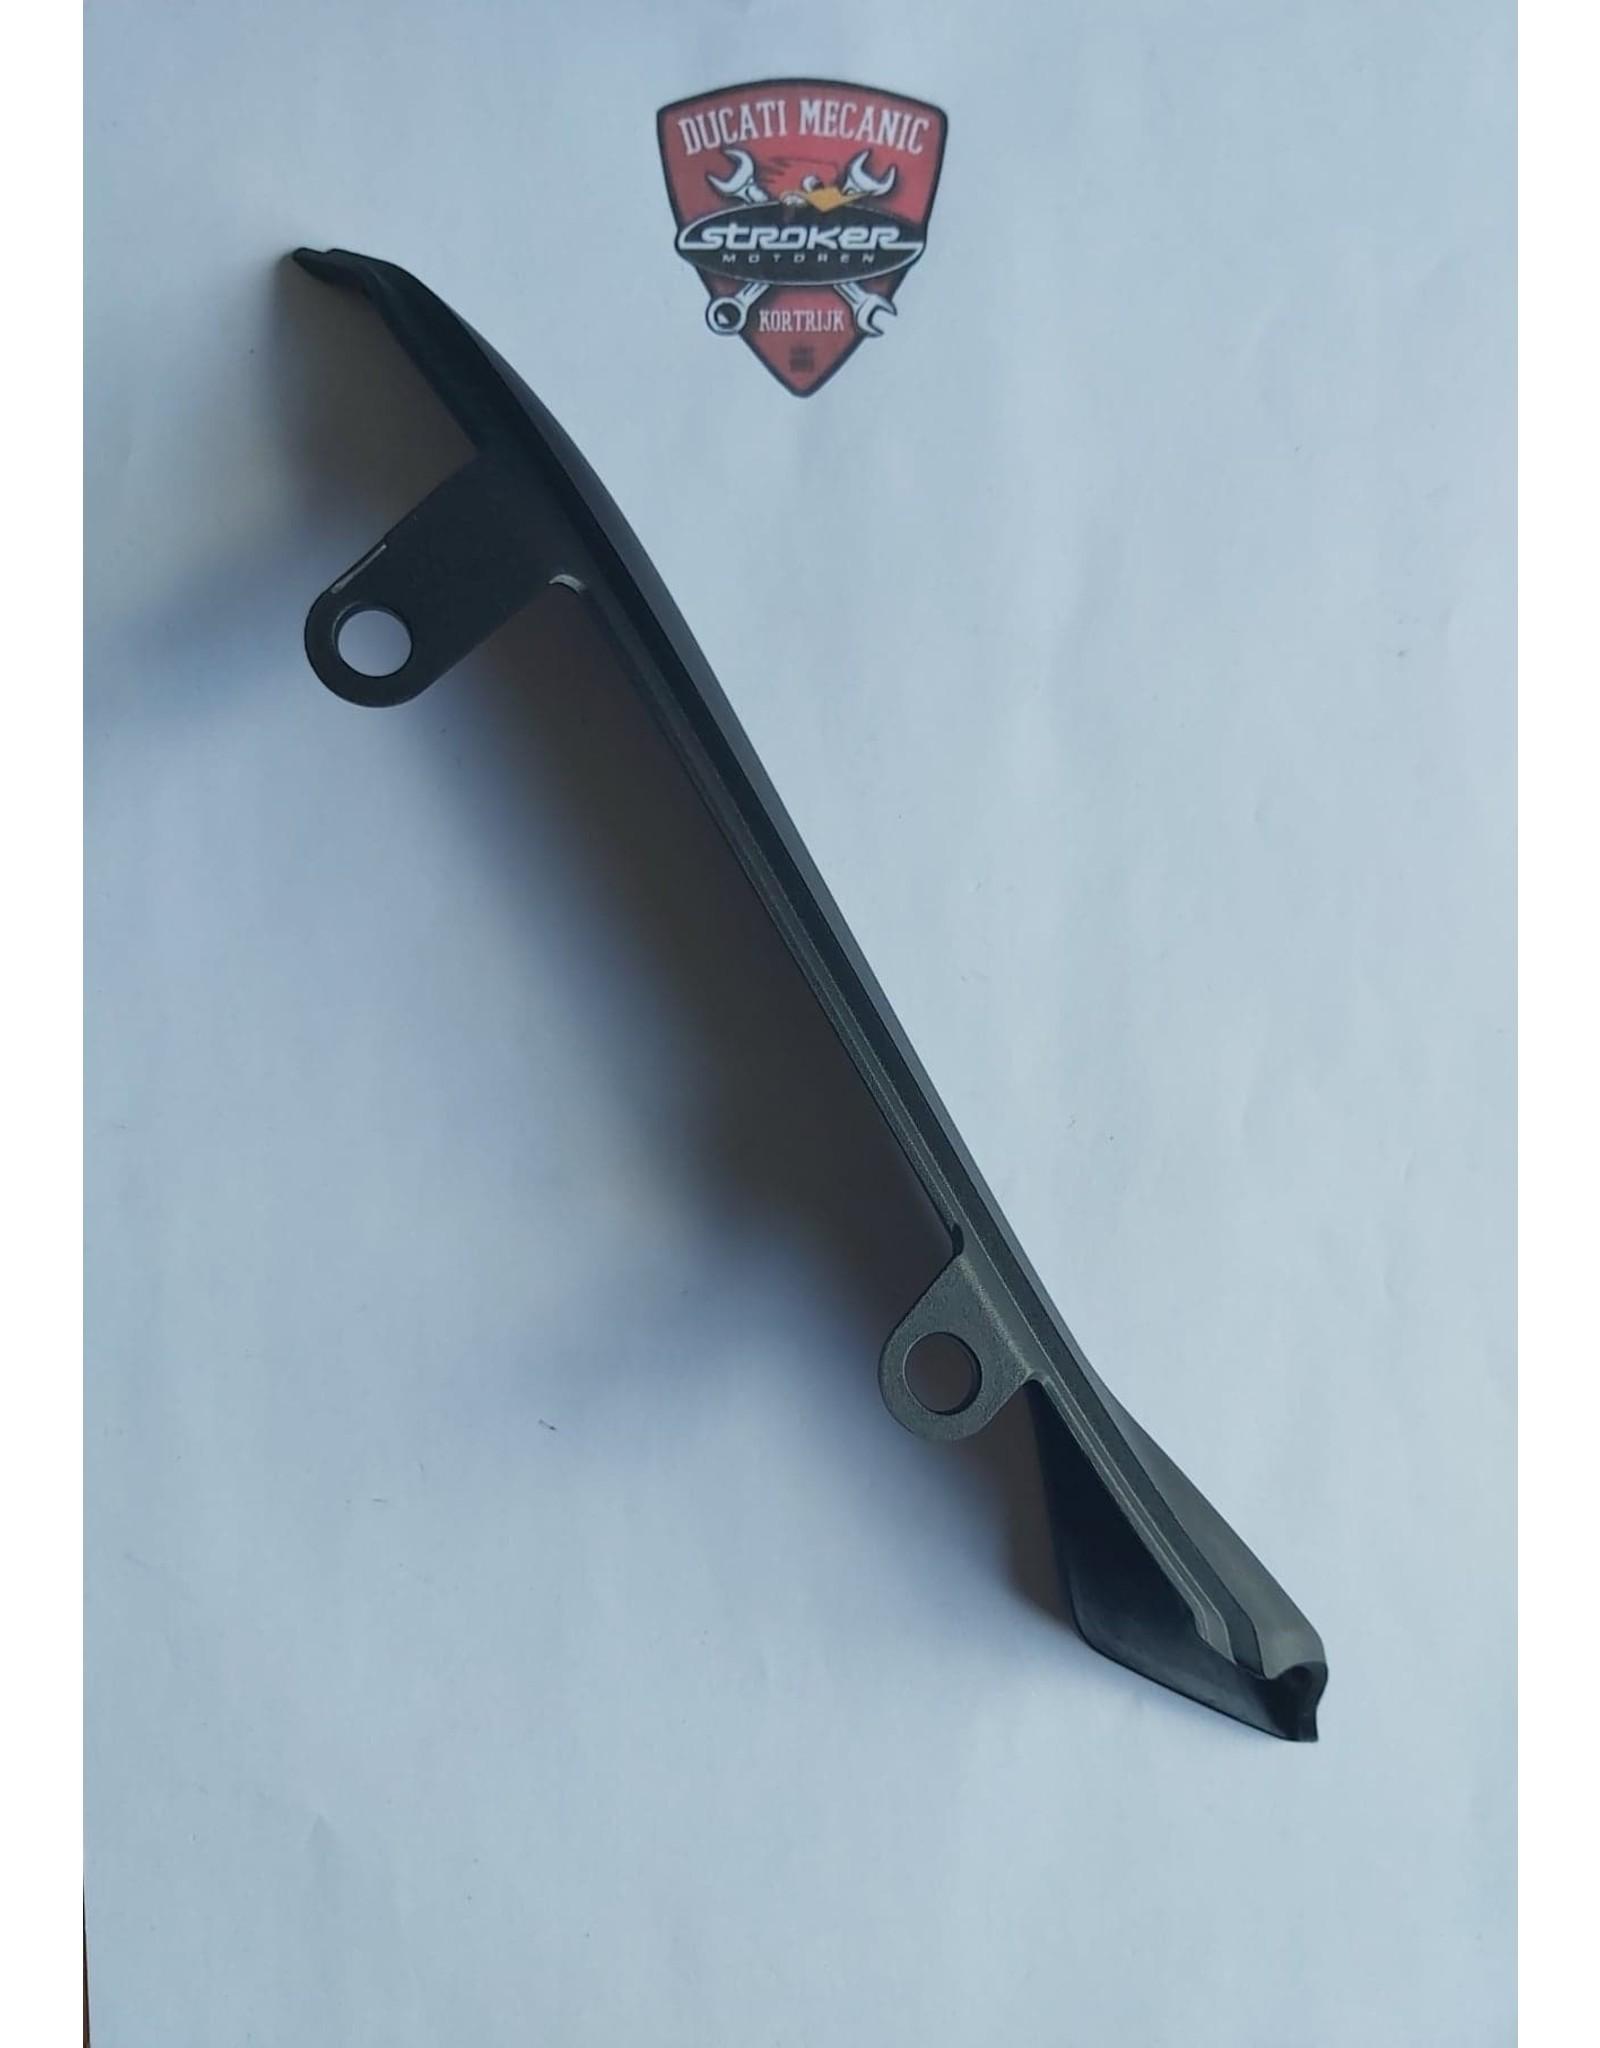 Ducati Ducati Monster 821 Right Hand Rear Seat Cover Cap 4601B241A